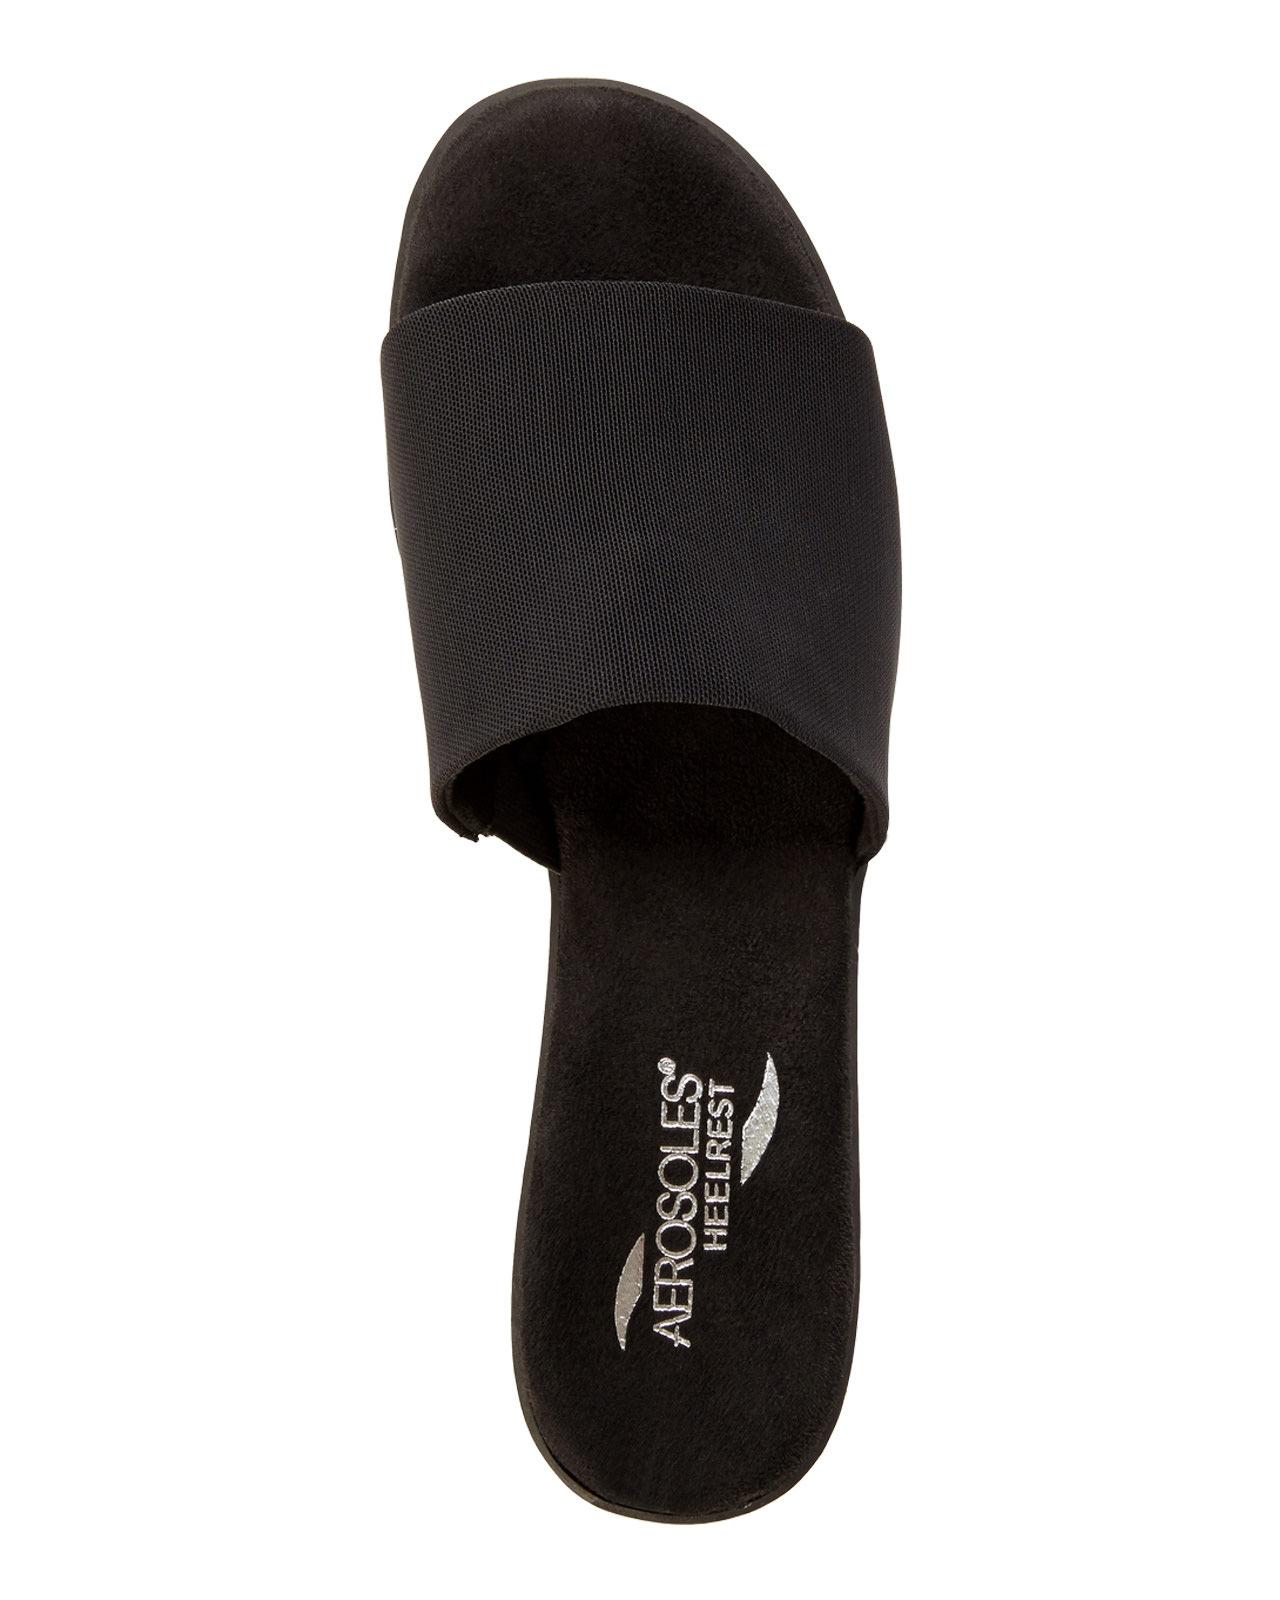 7db9851d8df3 Lyst - Aerosoles Badminton Wedge Sandals in Black